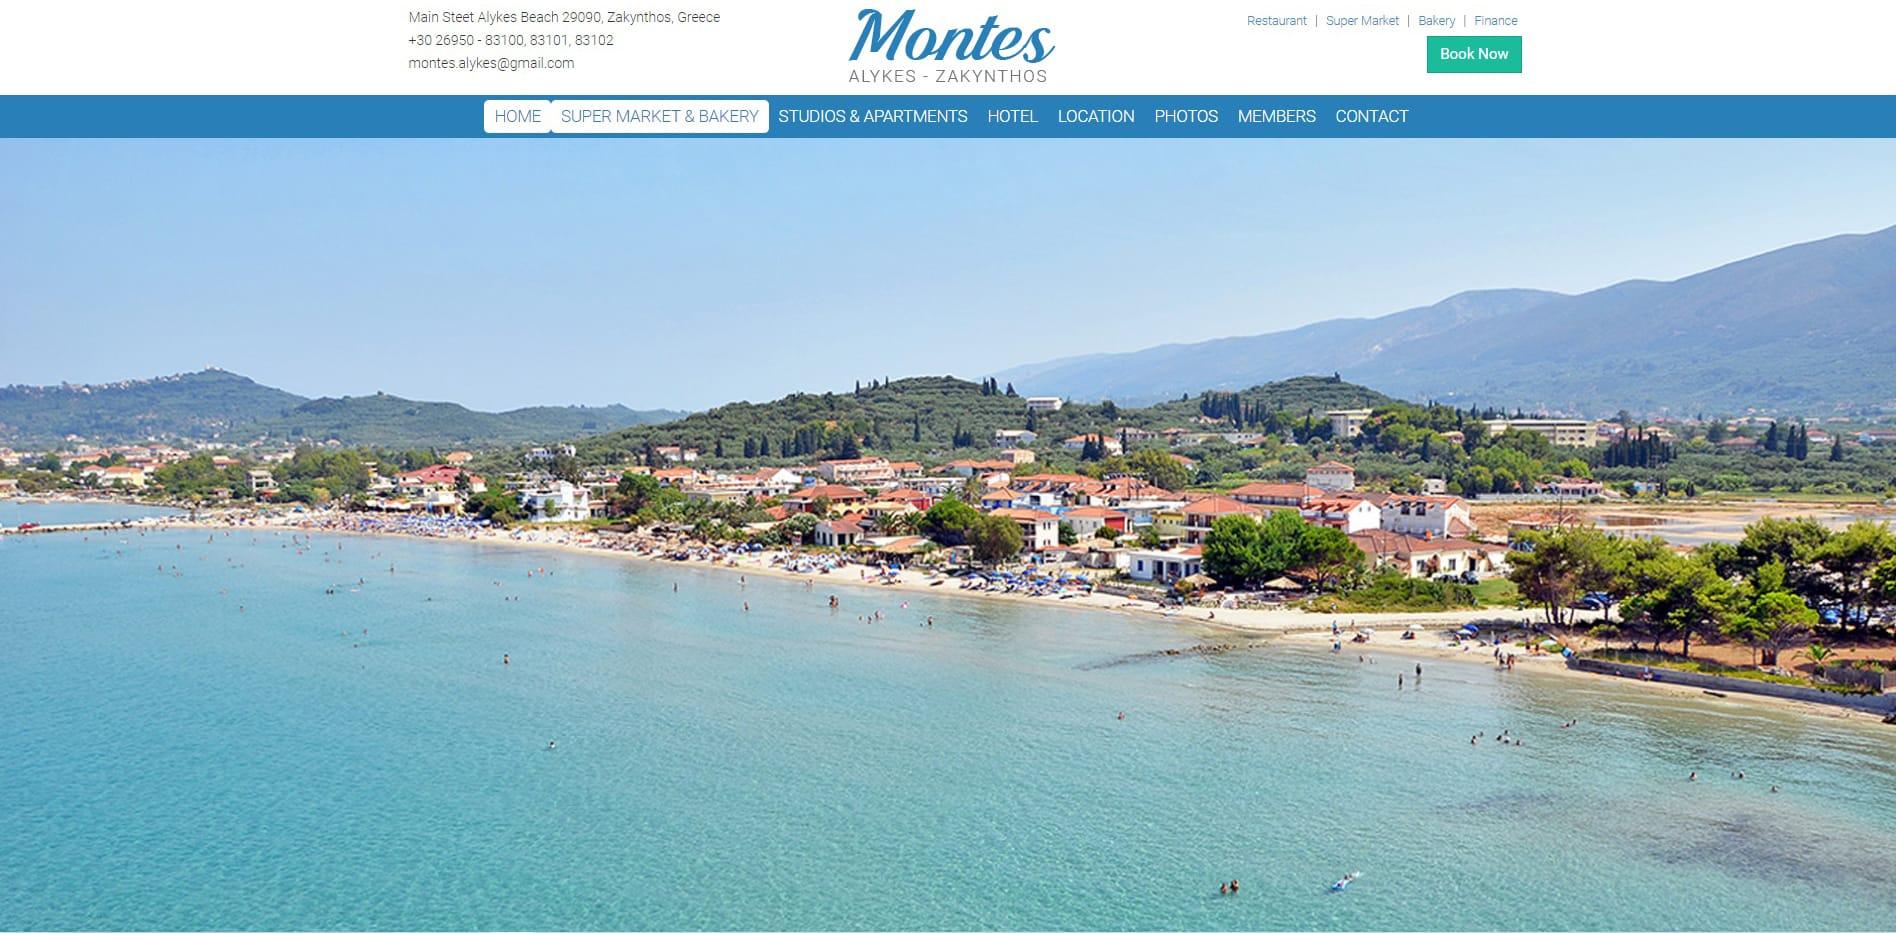 Montes Zakynthos